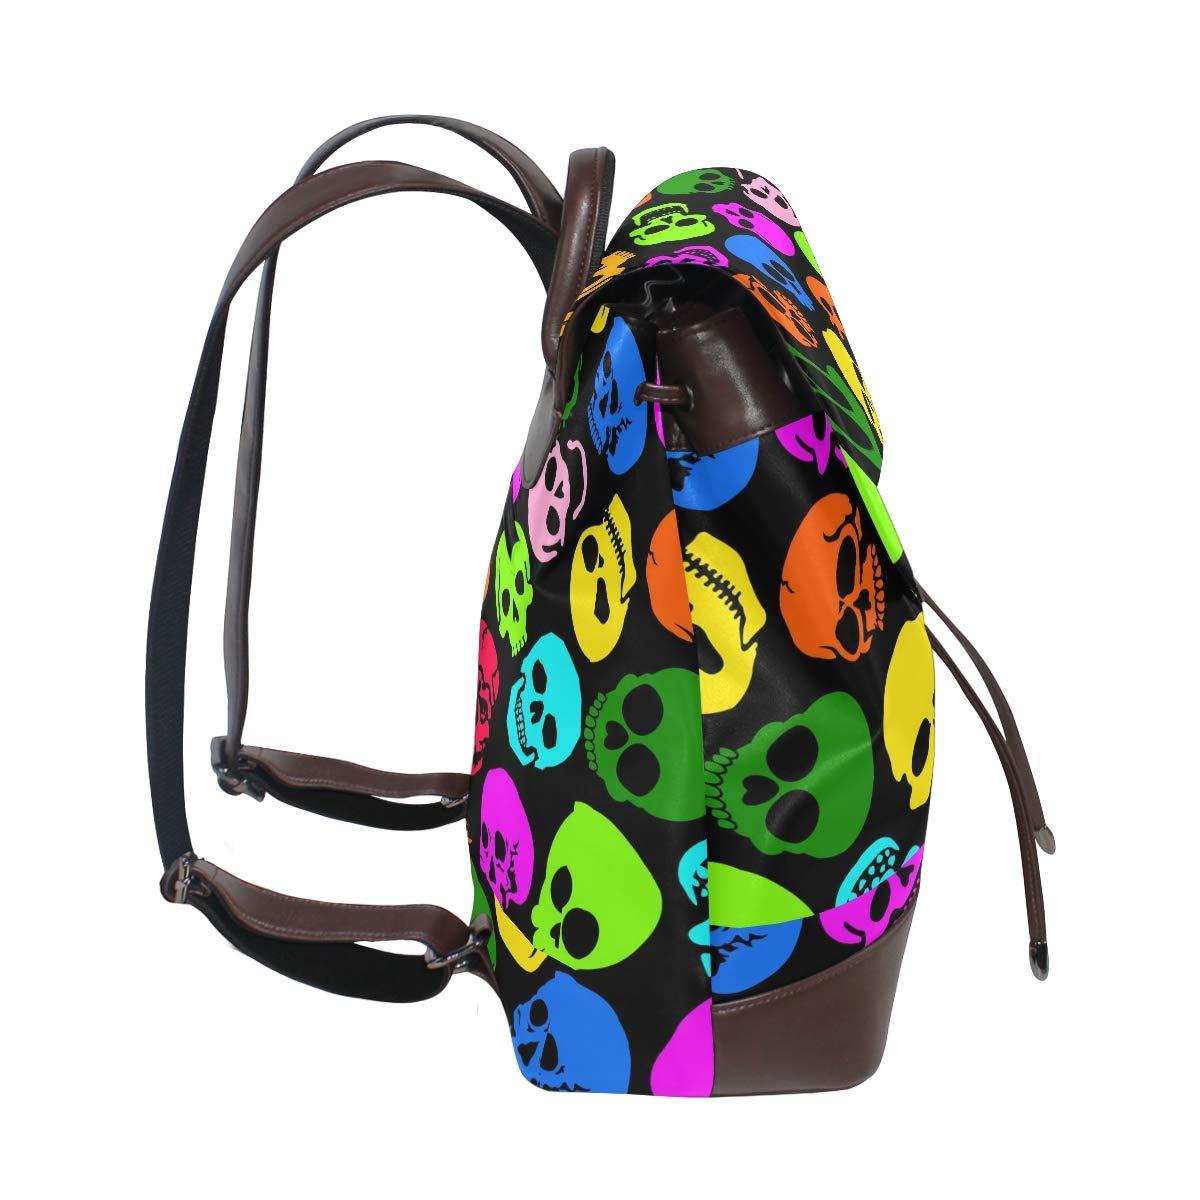 PU Leather Shoulder Bag,Colorful Skull Backpack,Portable Travel School Rucksack,Satchel with Top Handle